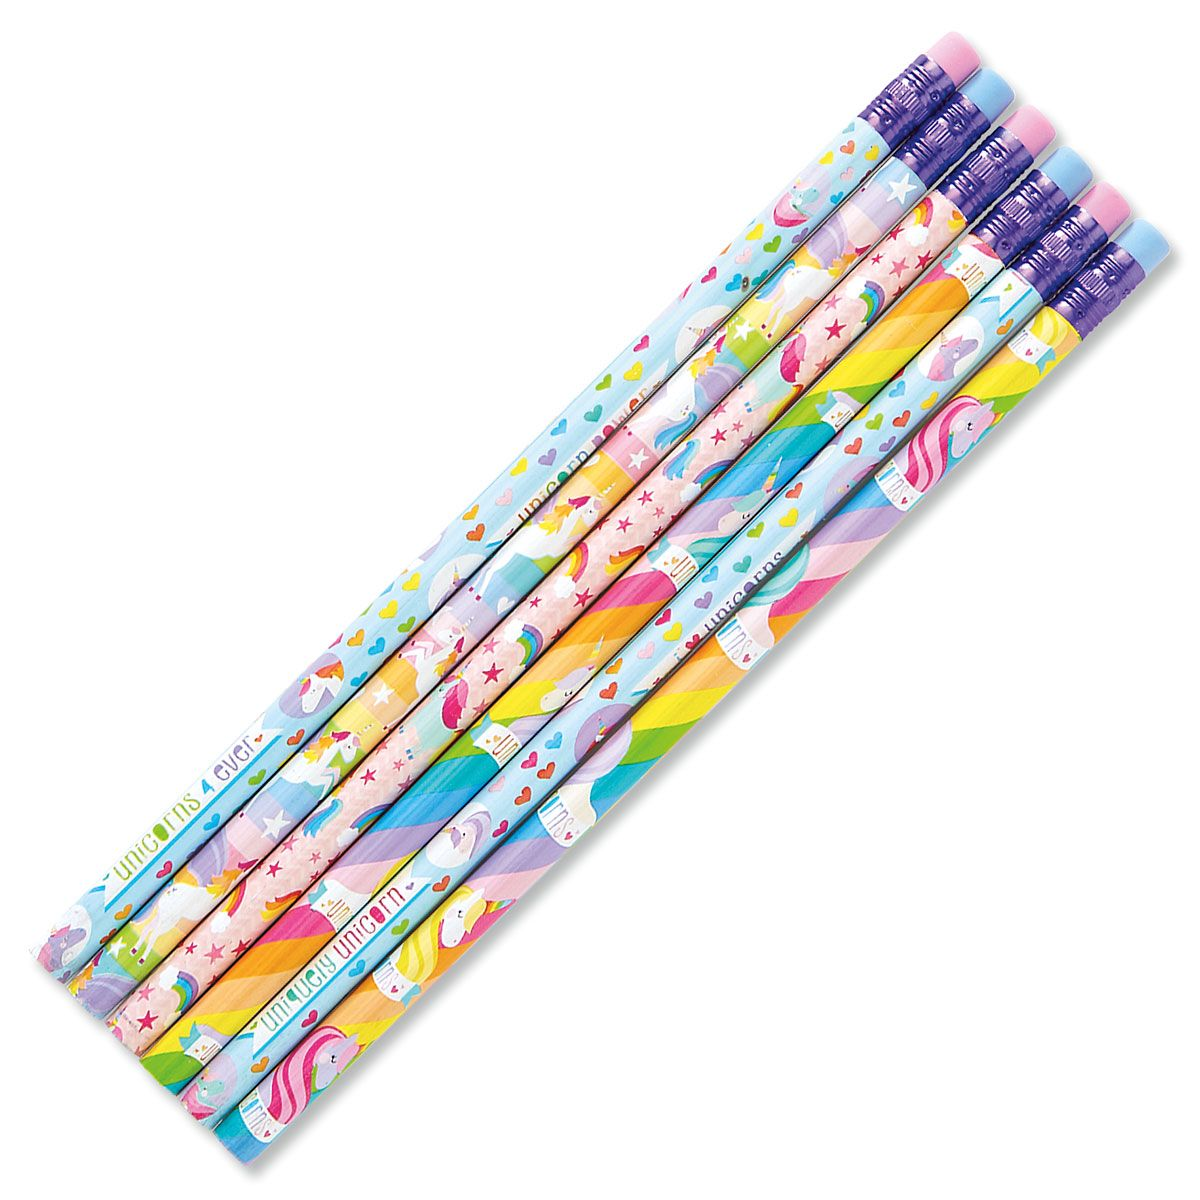 #2 Unicorn Hardwood Pencils